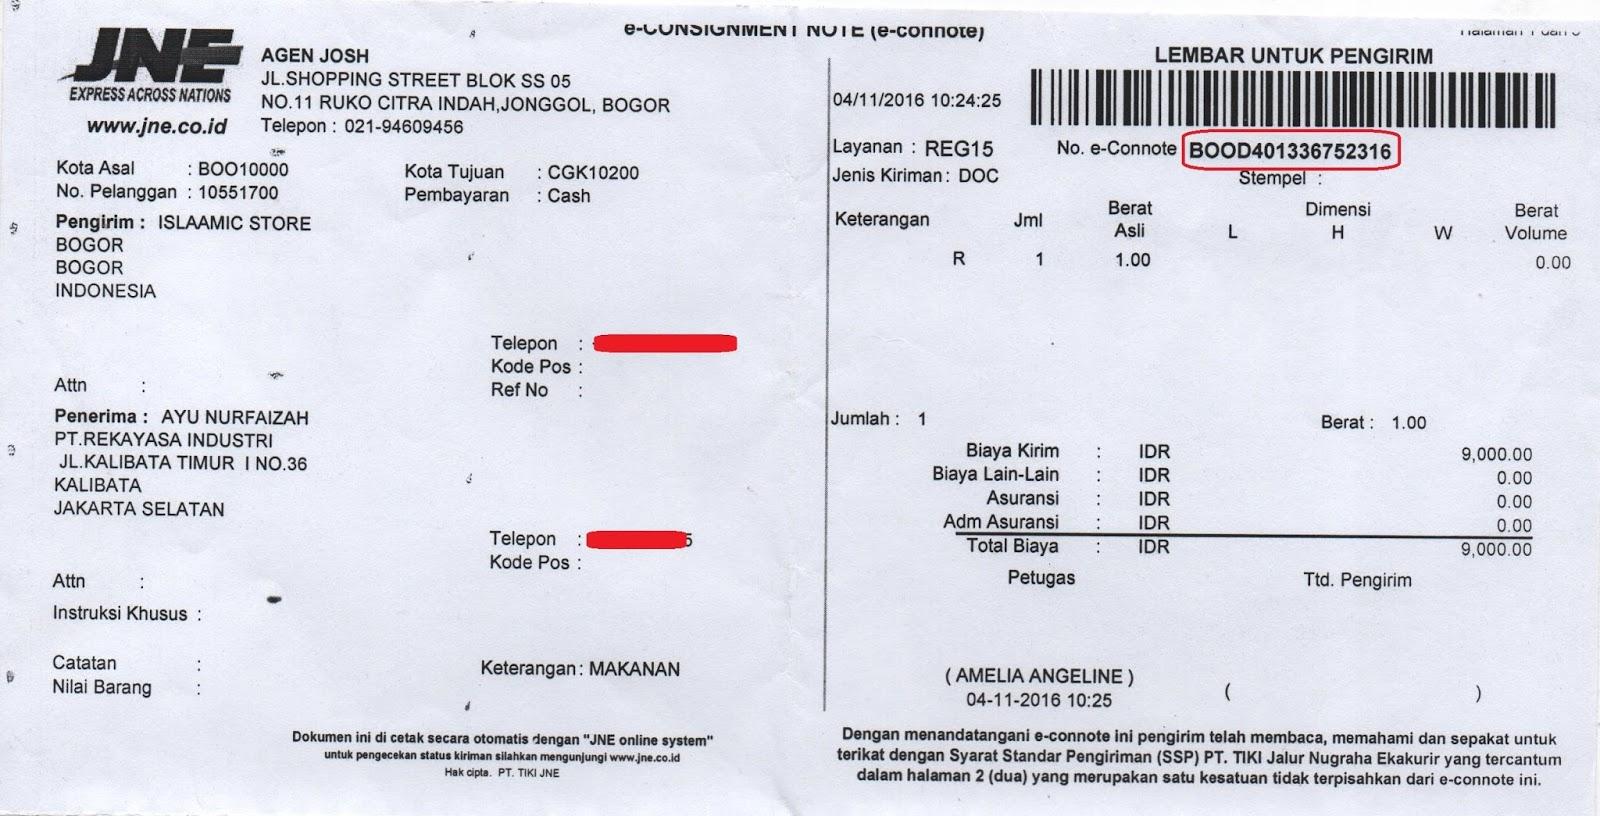 Contoh Resi Airwaybill Ekspedisi Pengiriman Brankas Arsip